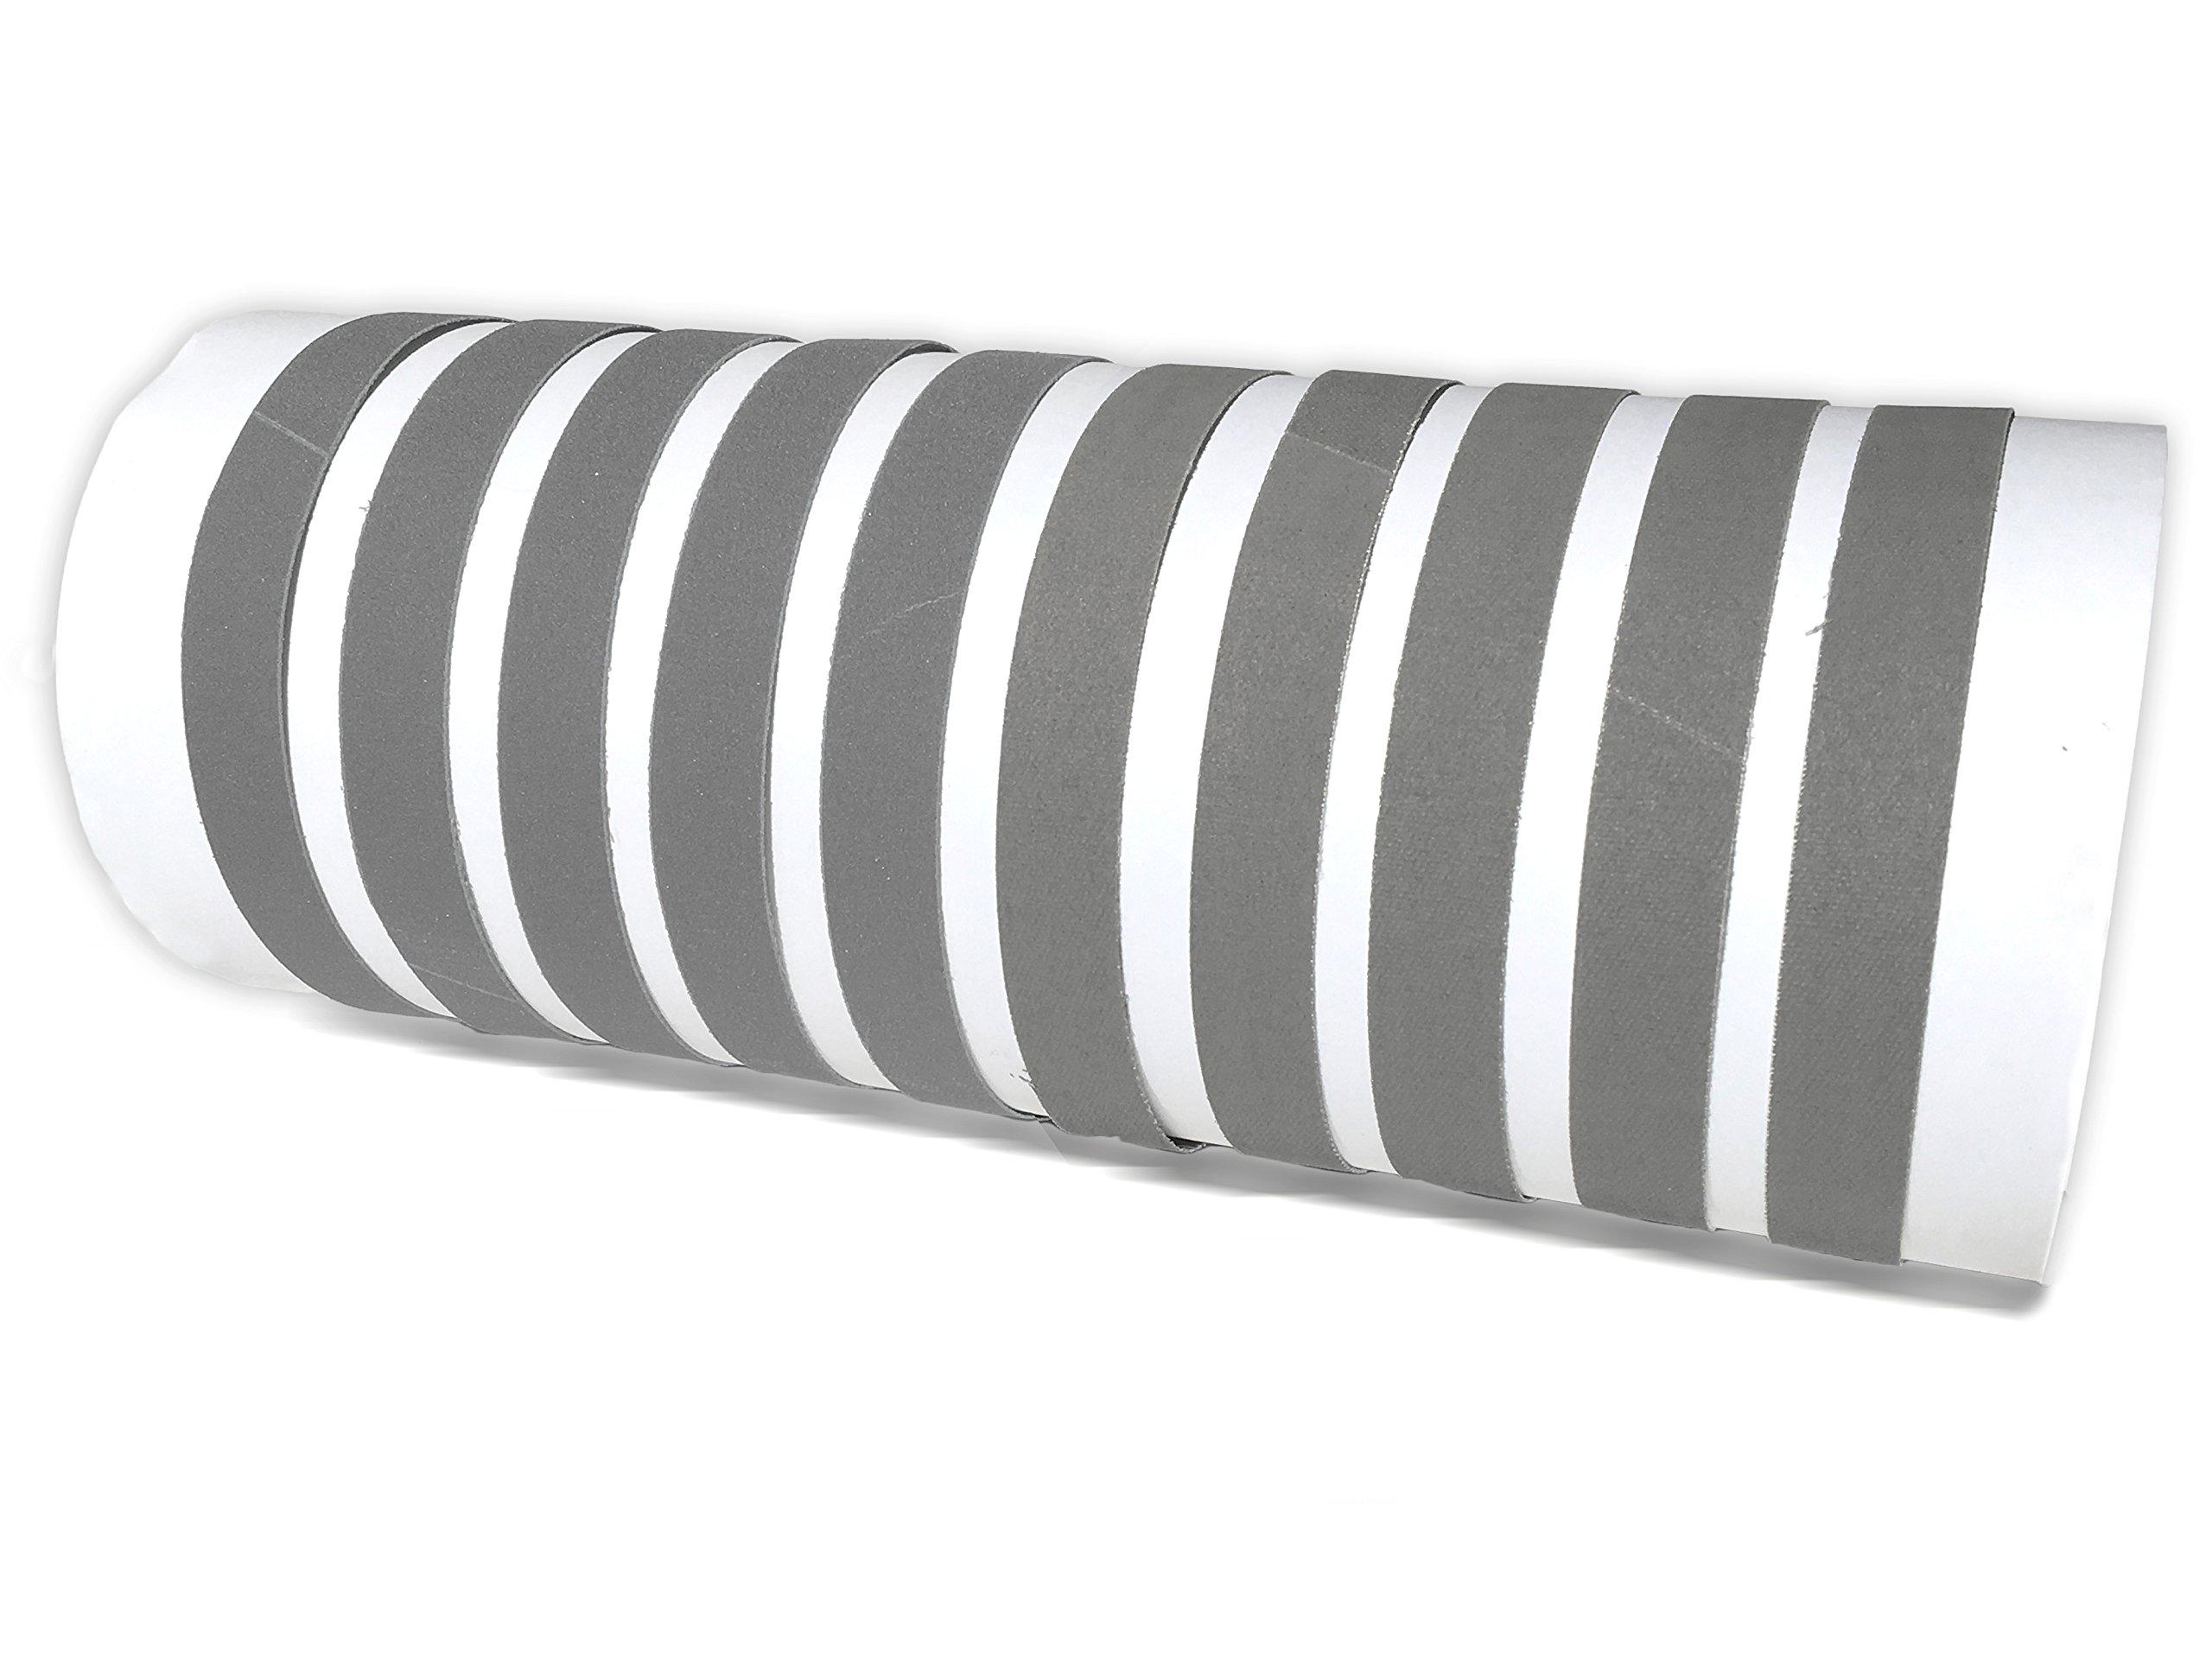 1 2 X 10 Inch Knife Sharpener Sanding Belts, 10 Pack (Compatible with Work Sharp WSCMB Combo Knife Sharpener) by Red Label Abrasives